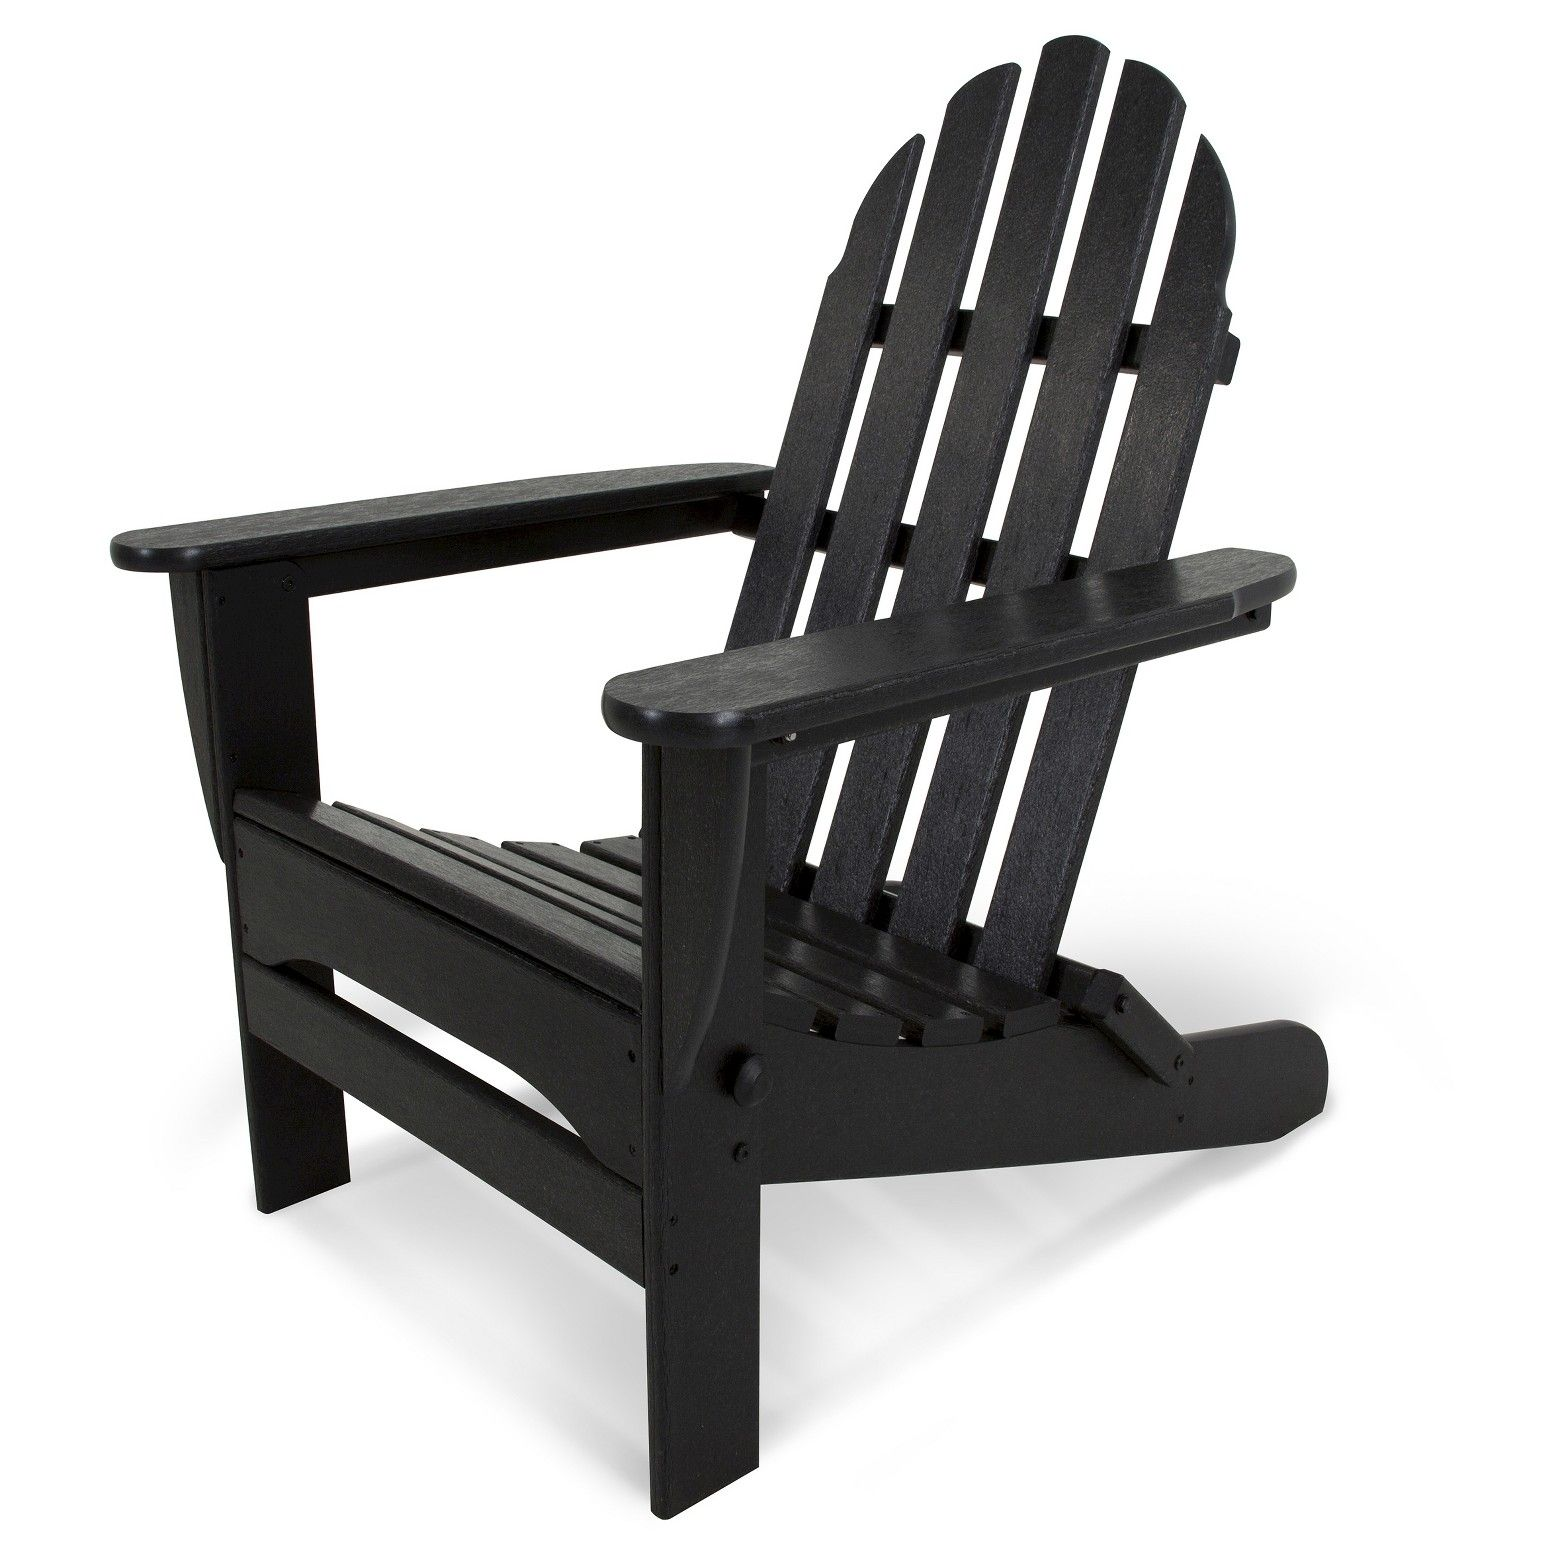 For Front Porch Polywood Classic Adirondack Black Plastic